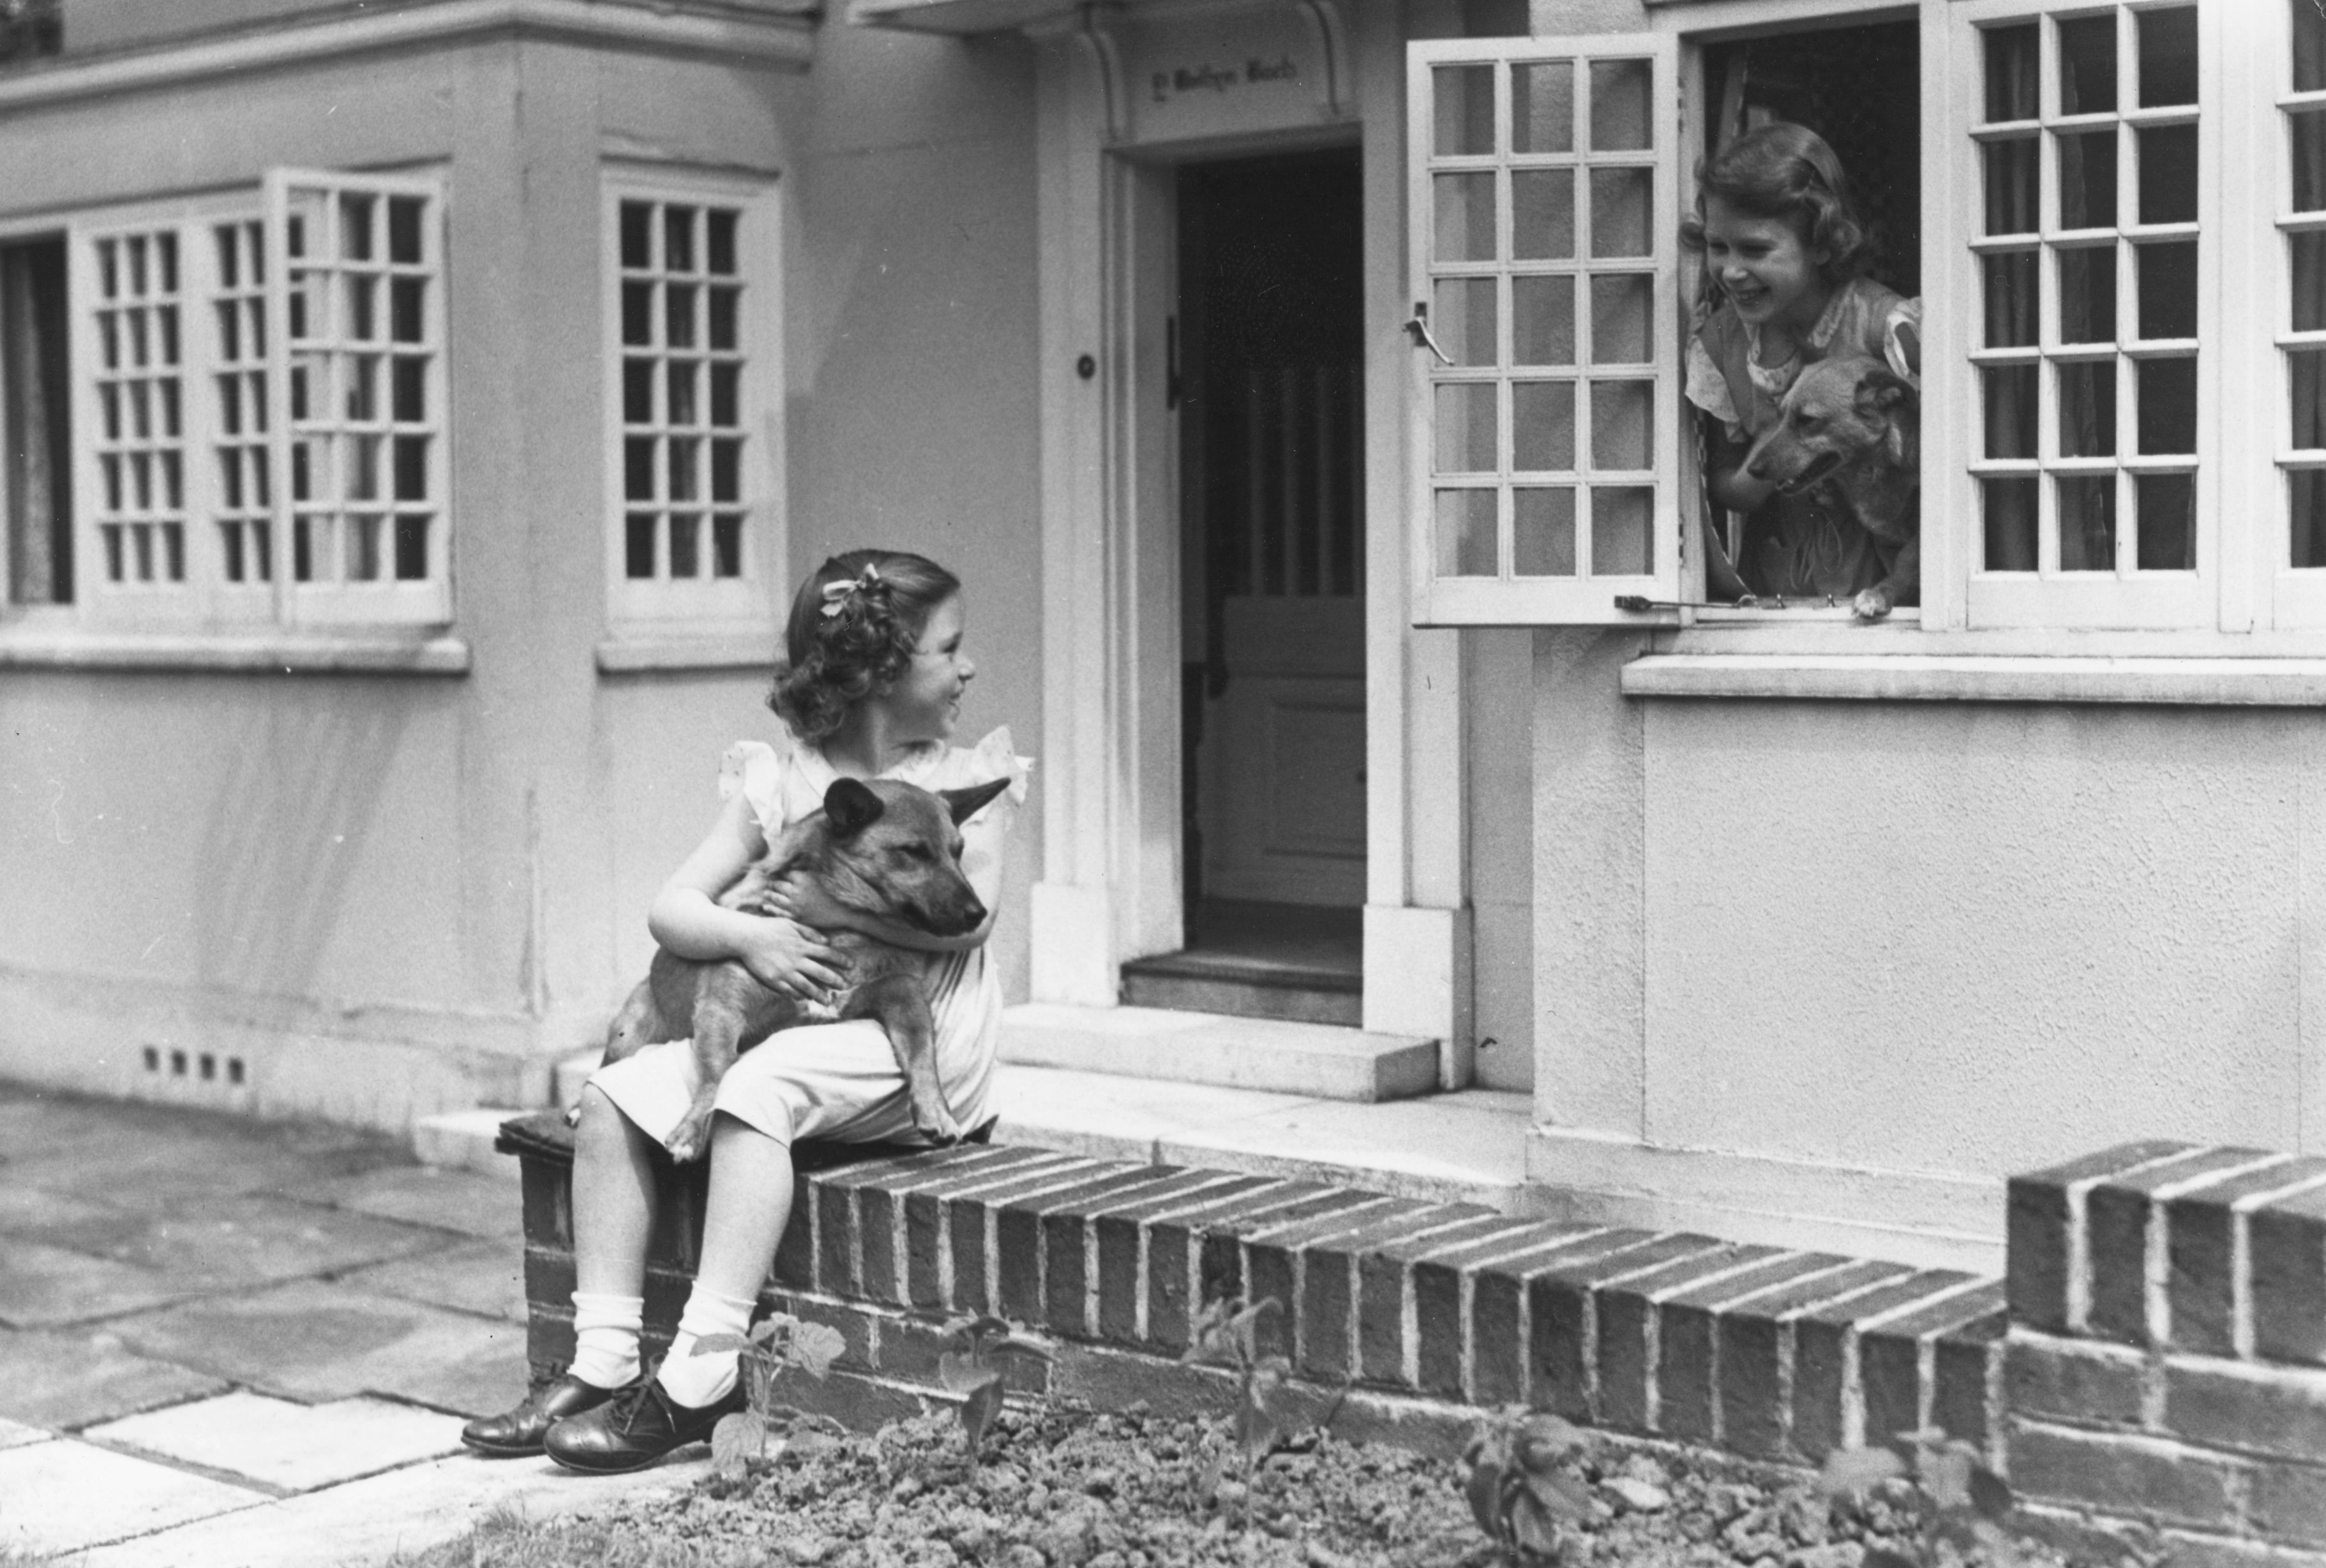 Queen Elizabeth Doll House